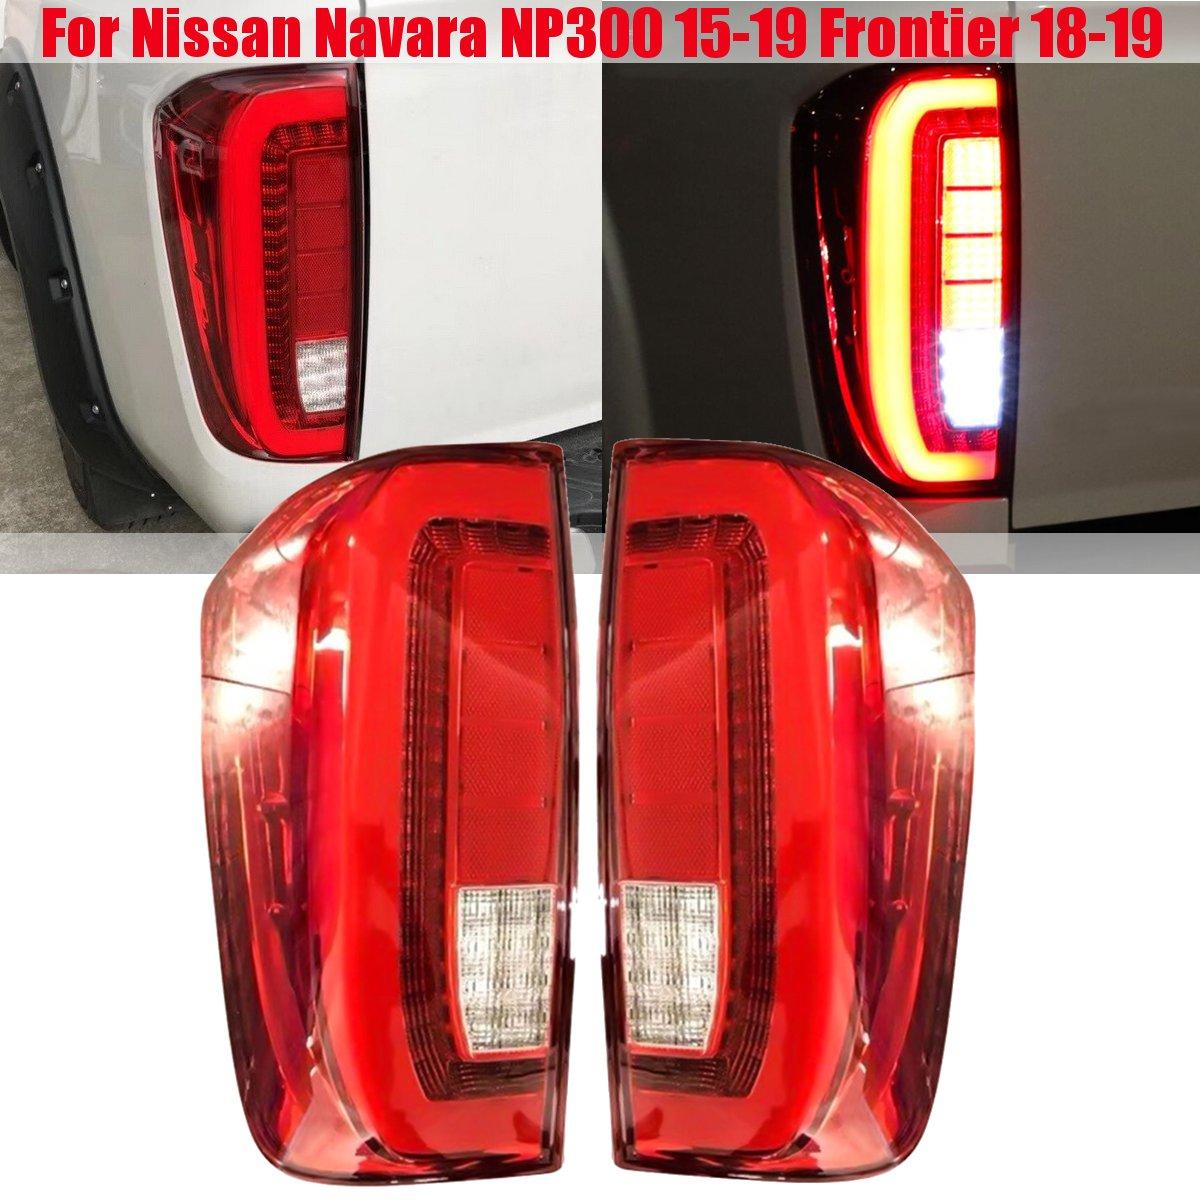 PAIR Tail Lmap Taillight Taillamp Assy Rear Brake Light Rear Lamp For Nissan Navara NP300 2015